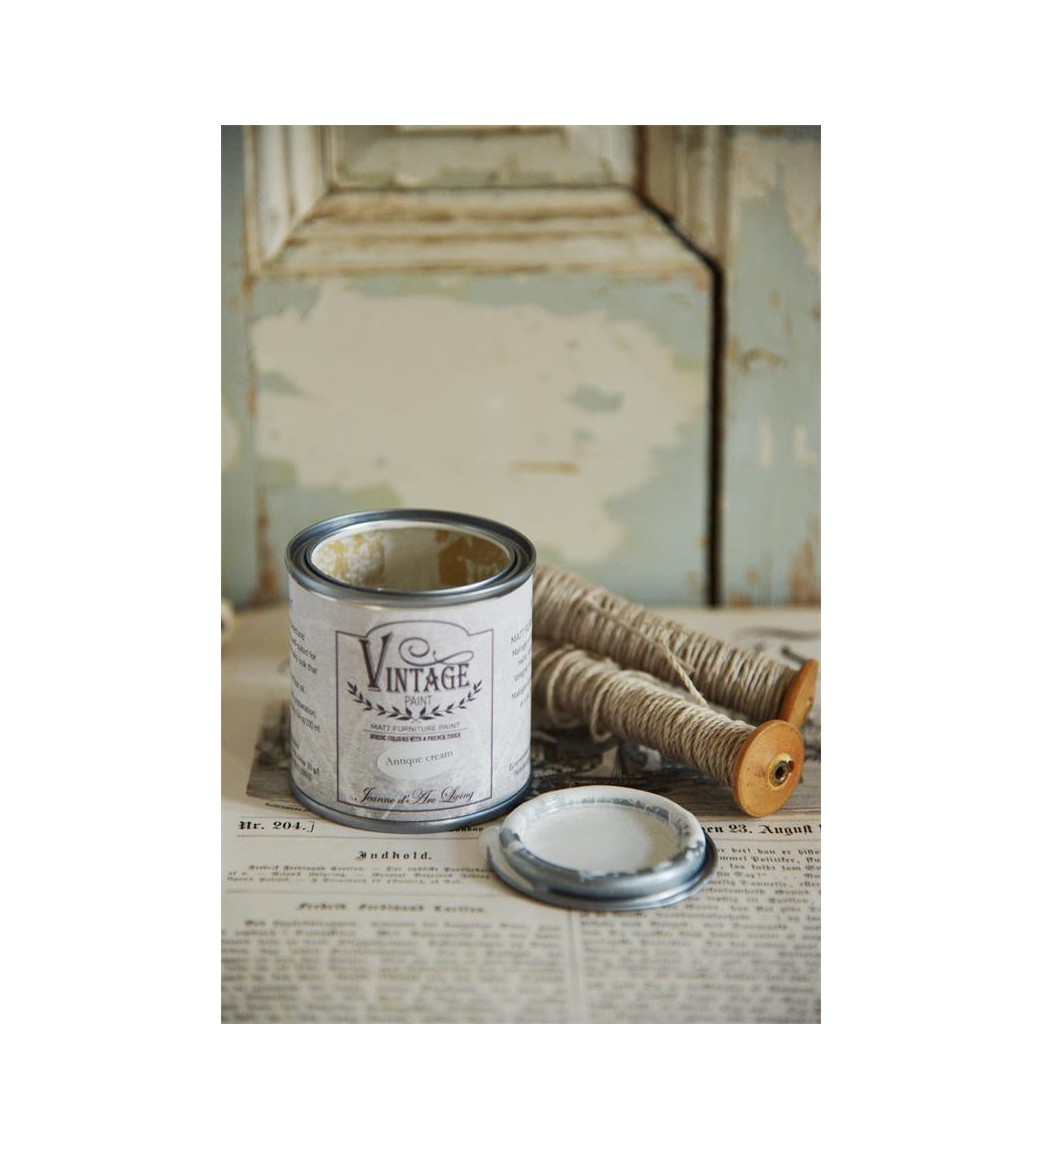 Kalkmaling Antique cream 100 ml - 1